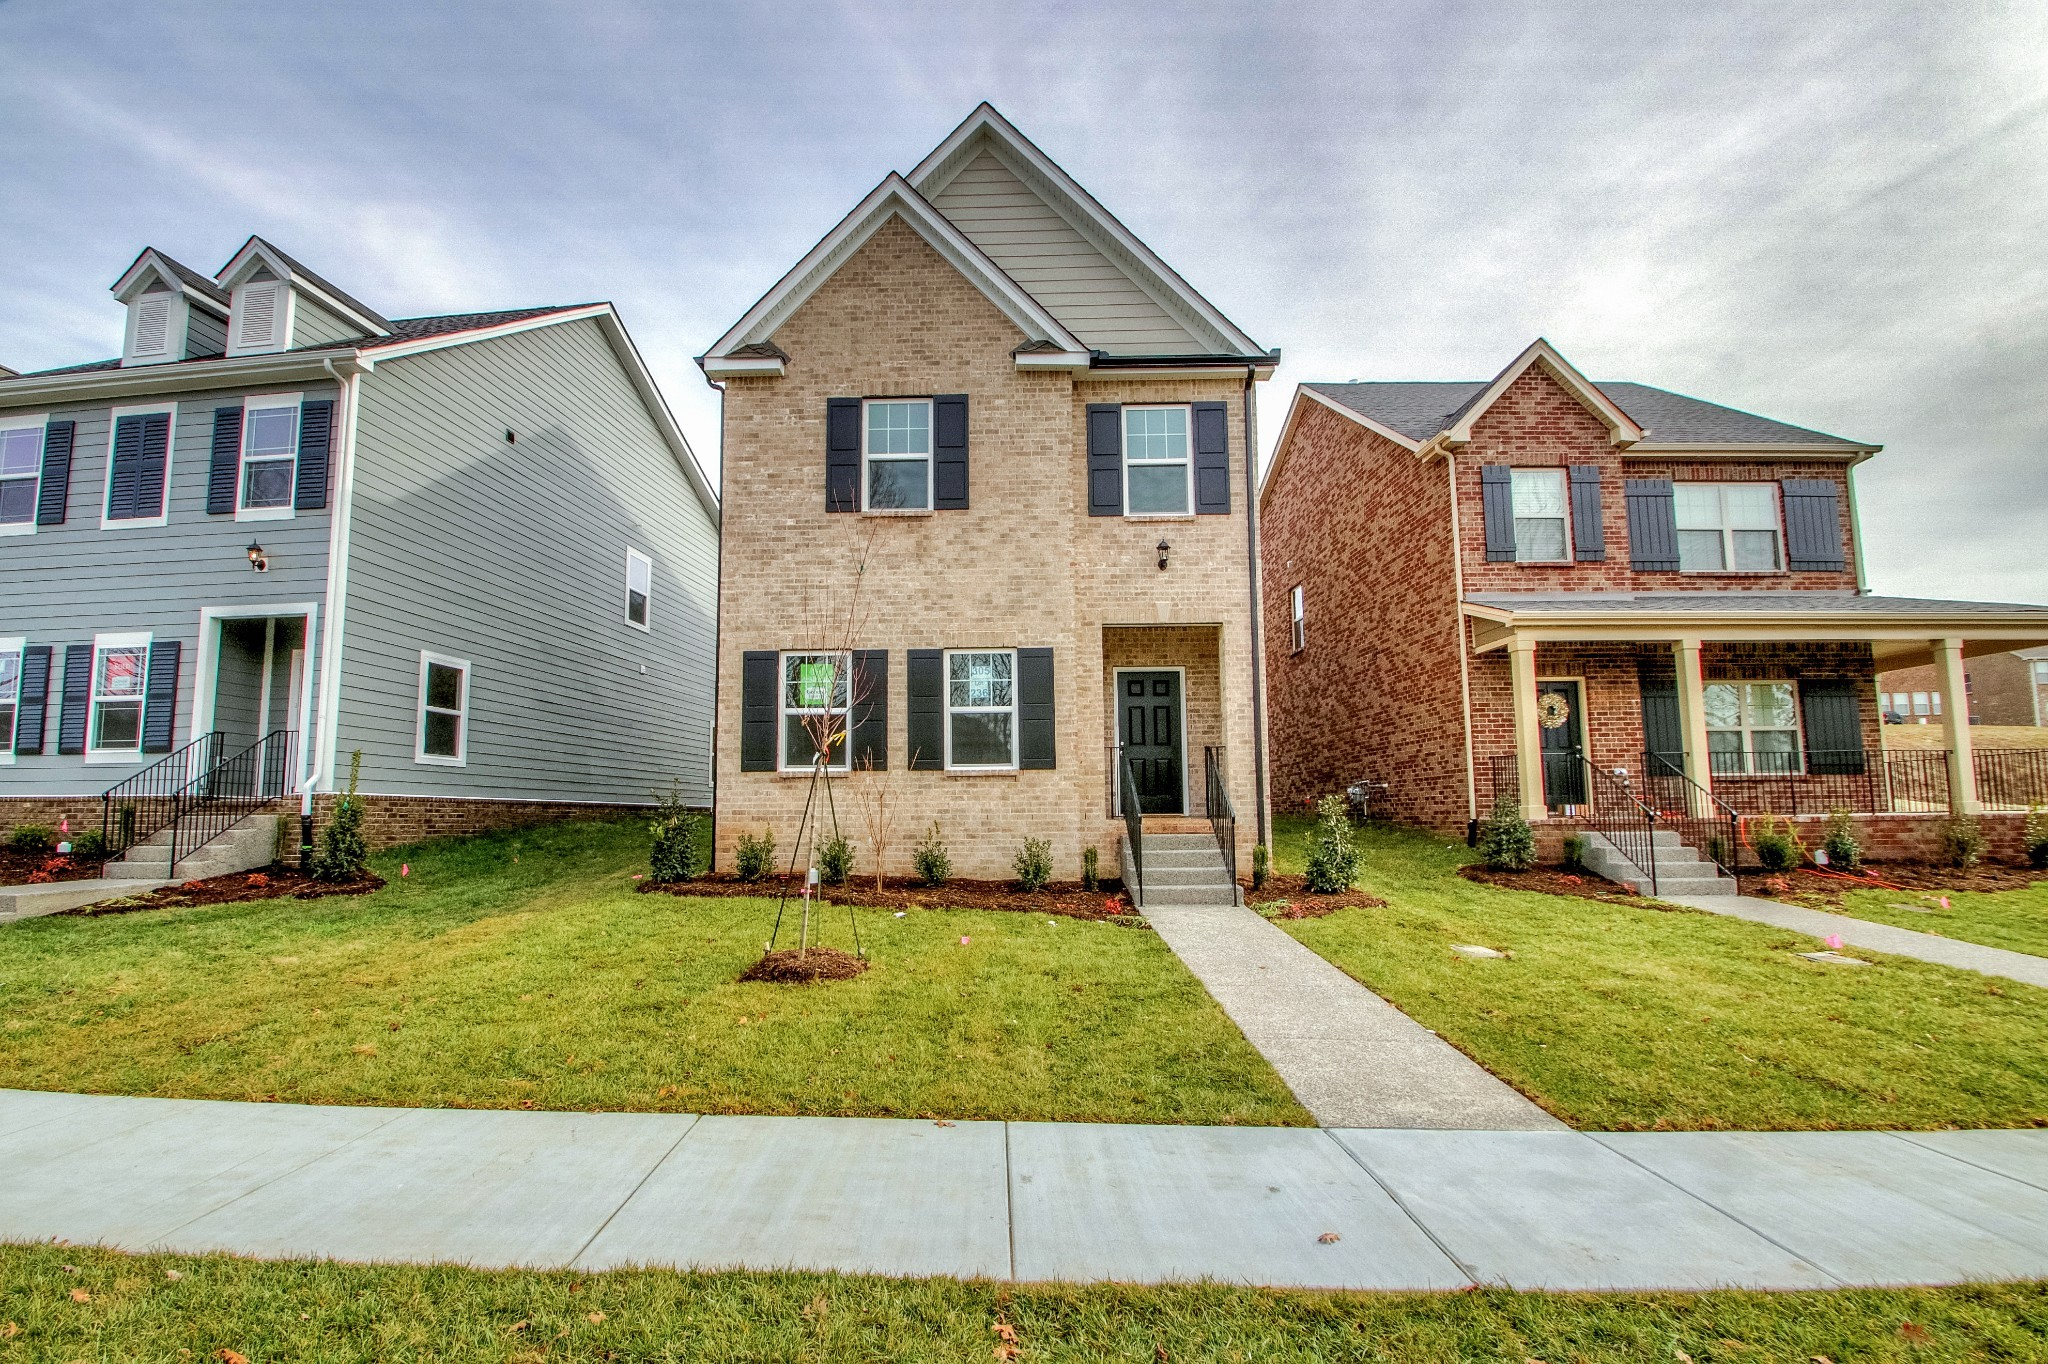 305 Carellton Drive (CC236), Gallatin, TN 37066 - Gallatin, TN real estate listing